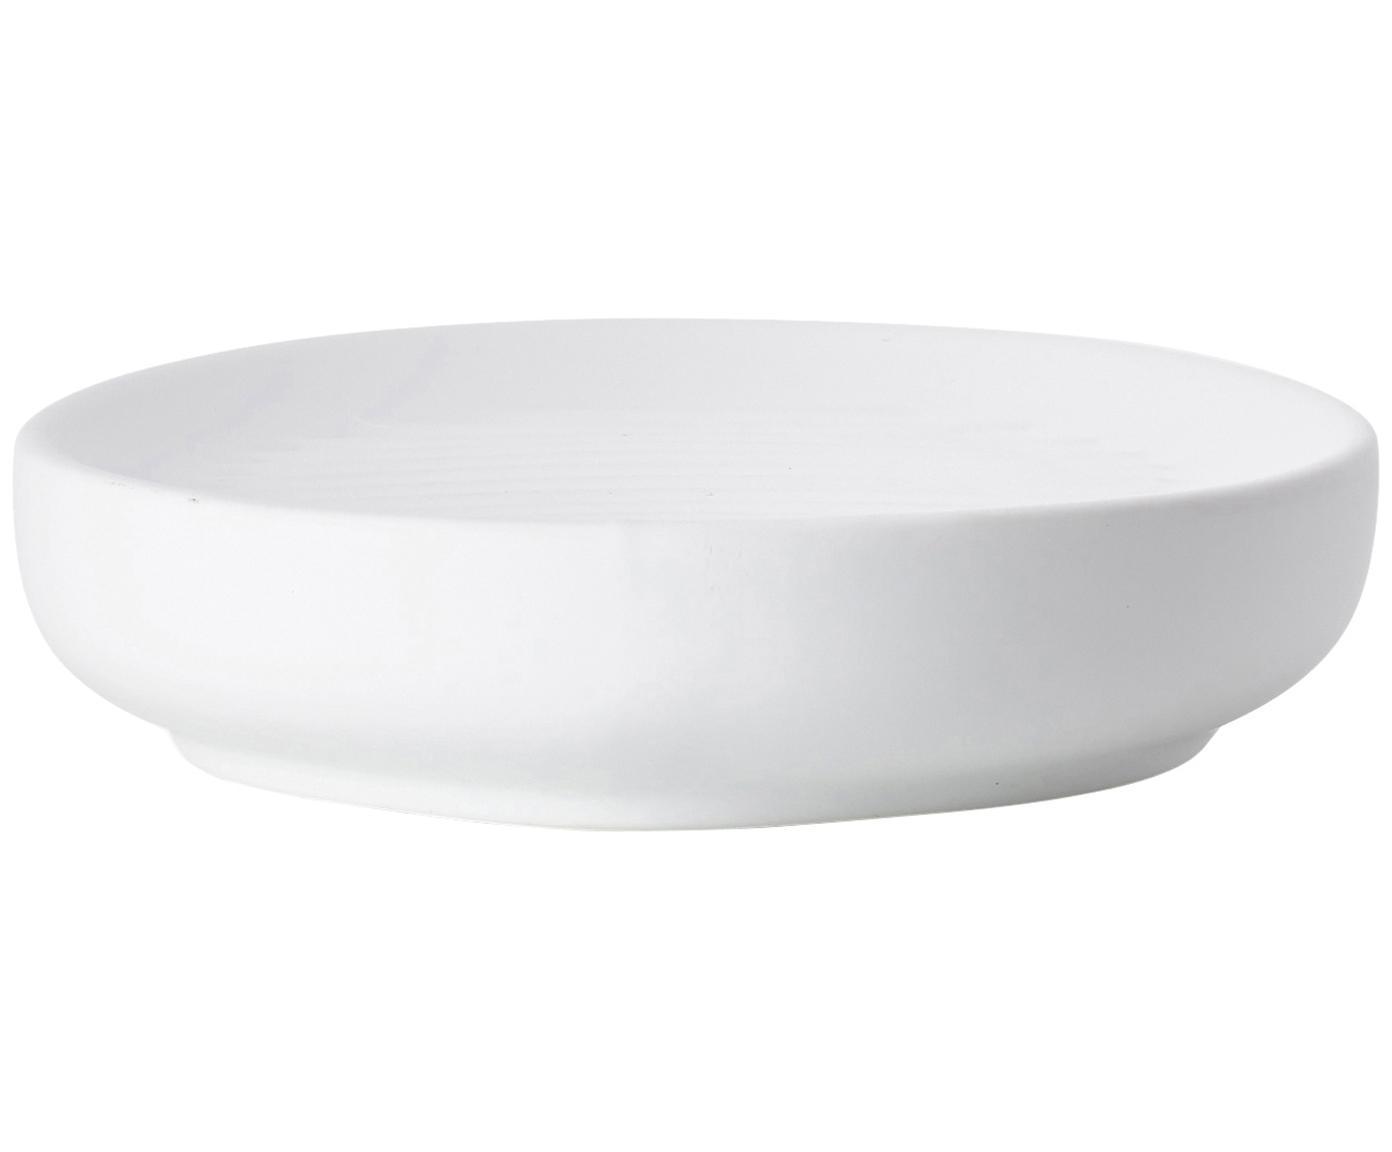 Porzellan-Seifenschale Ume, Porzellan, Weiß, Ø 12 x H 3 cm